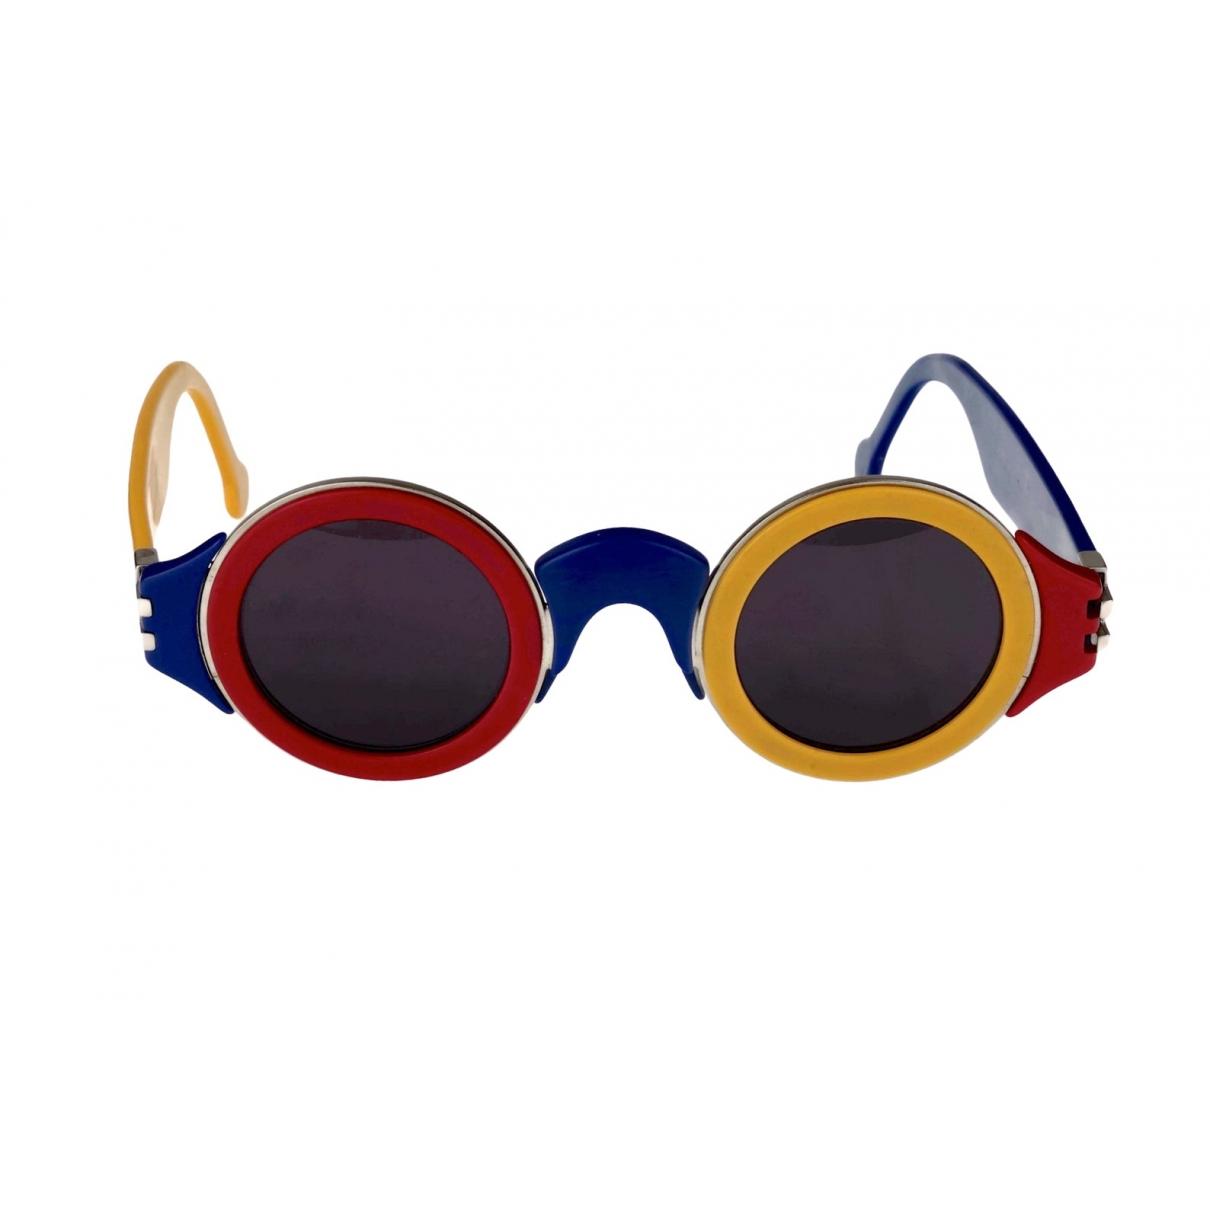 Karl Lagerfeld - Lunettes   pour homme - multicolore